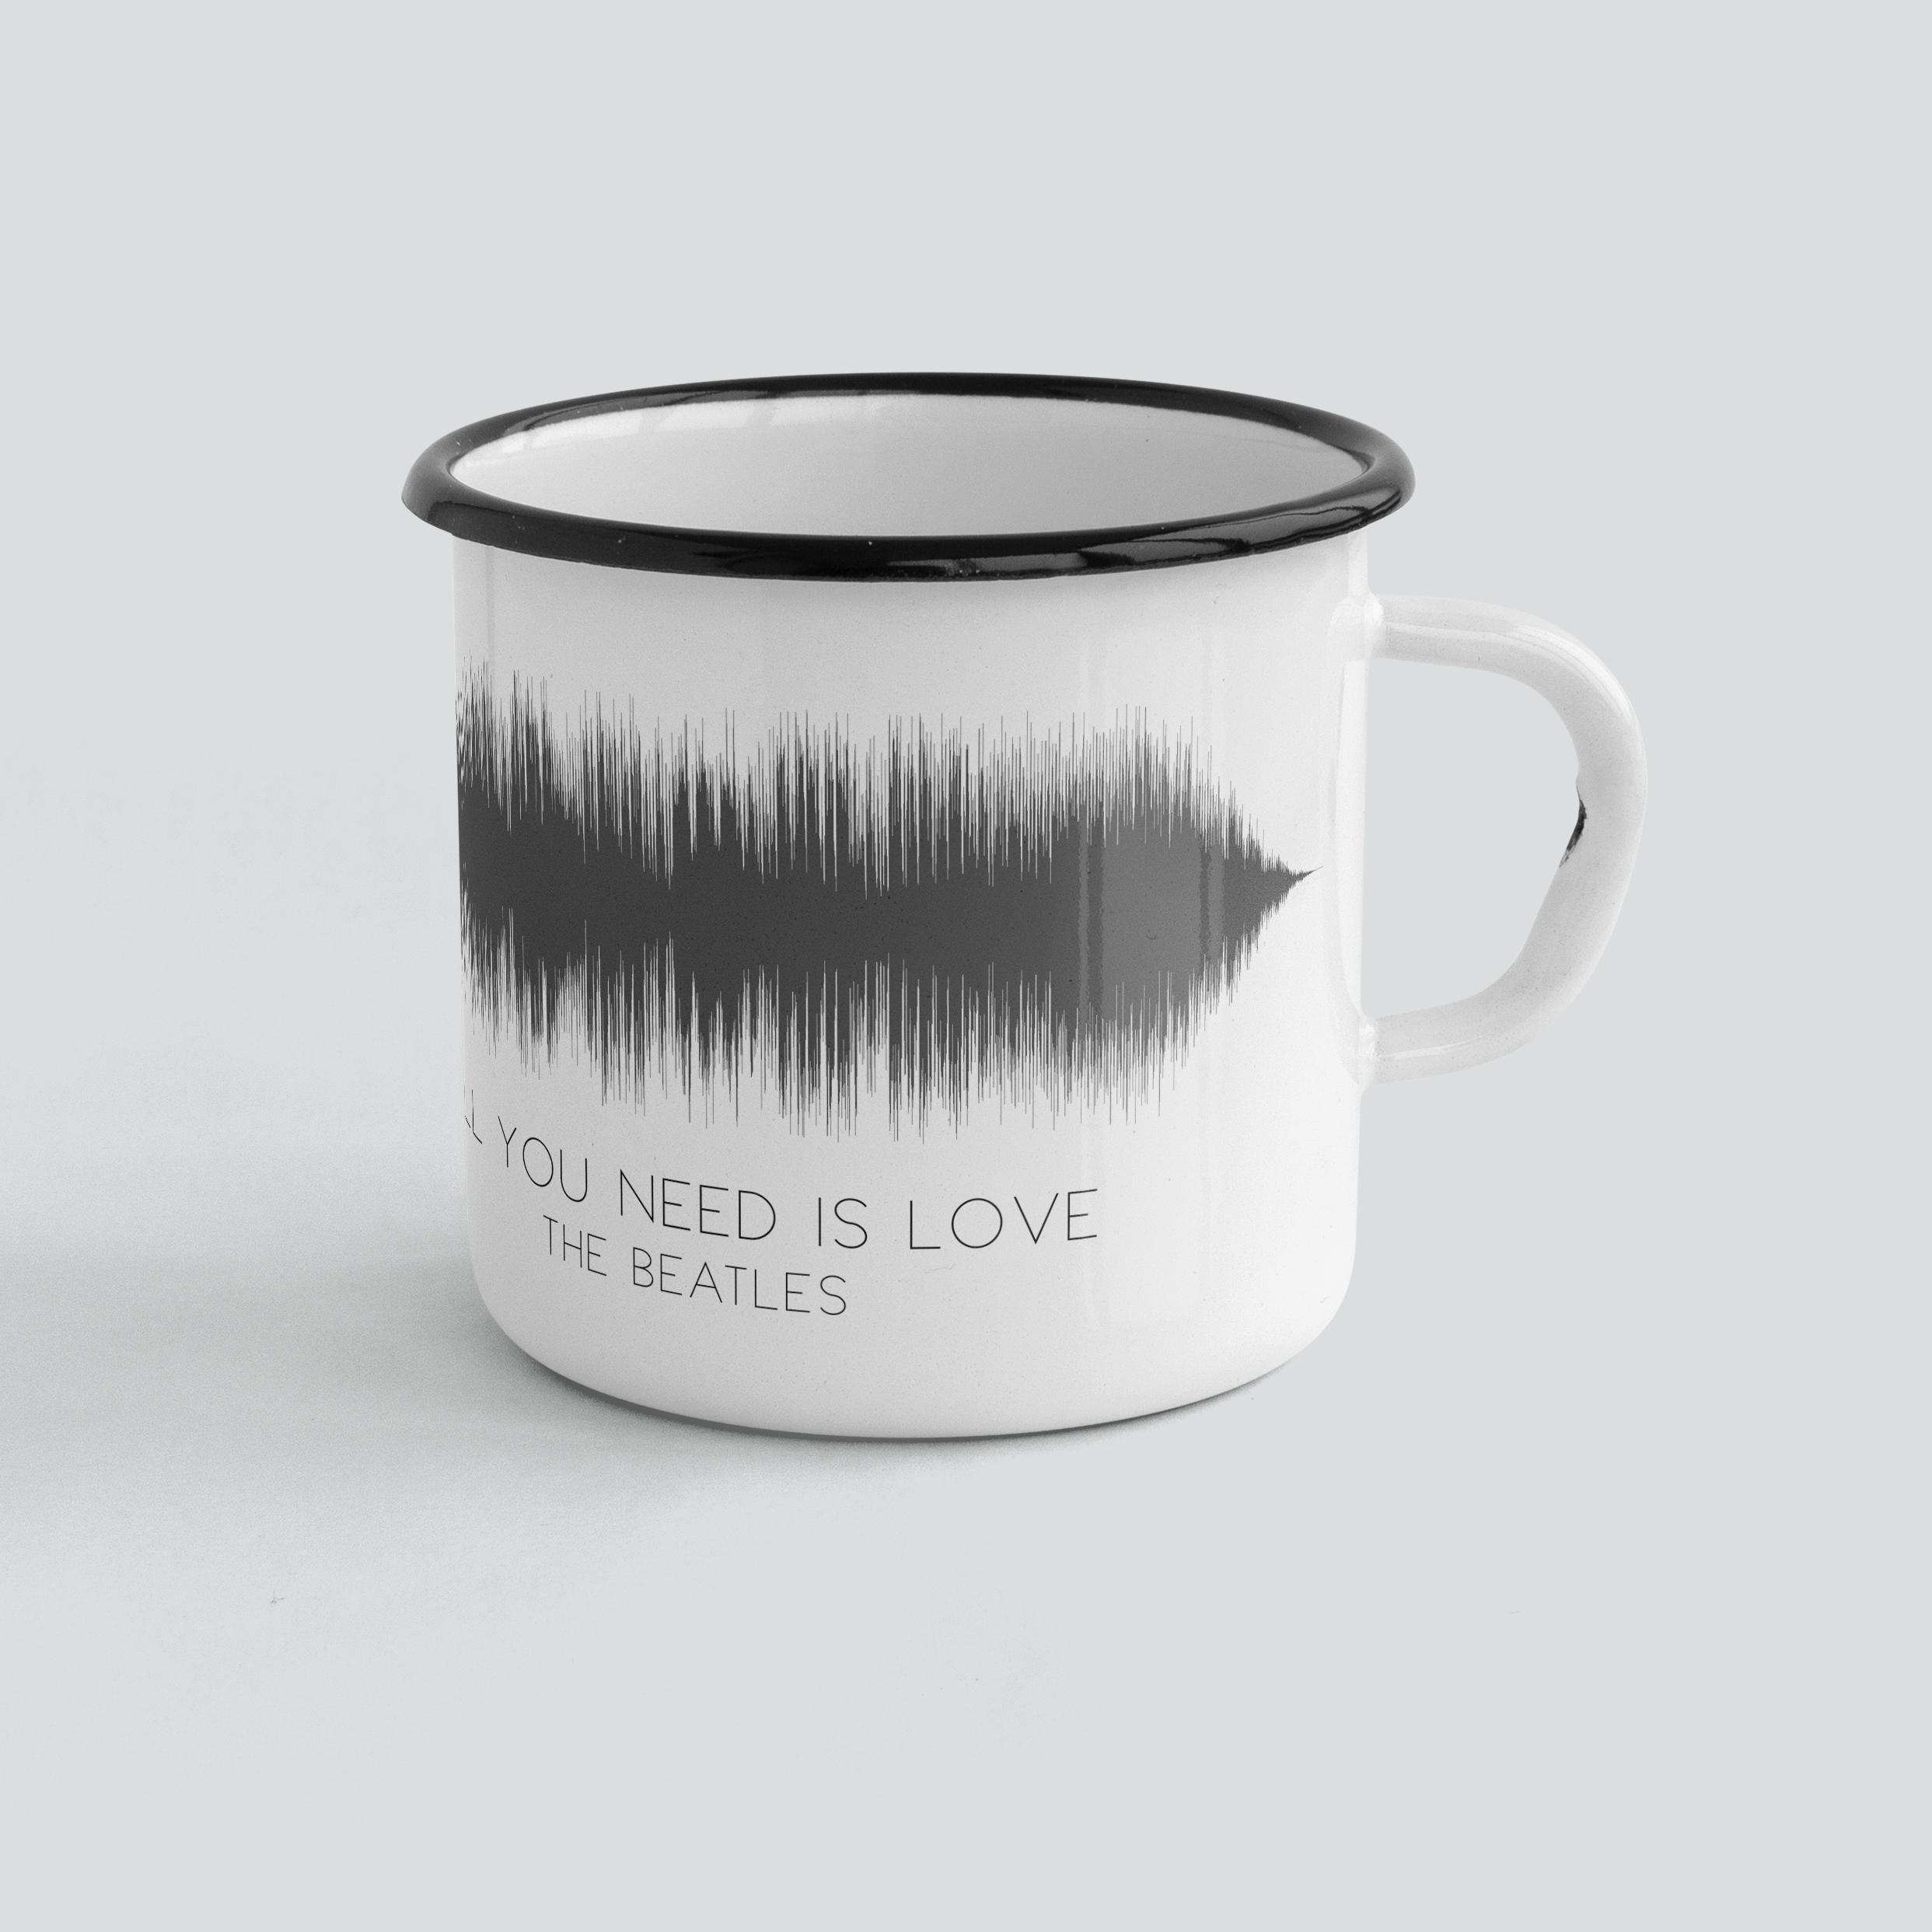 beatles mug.jpg